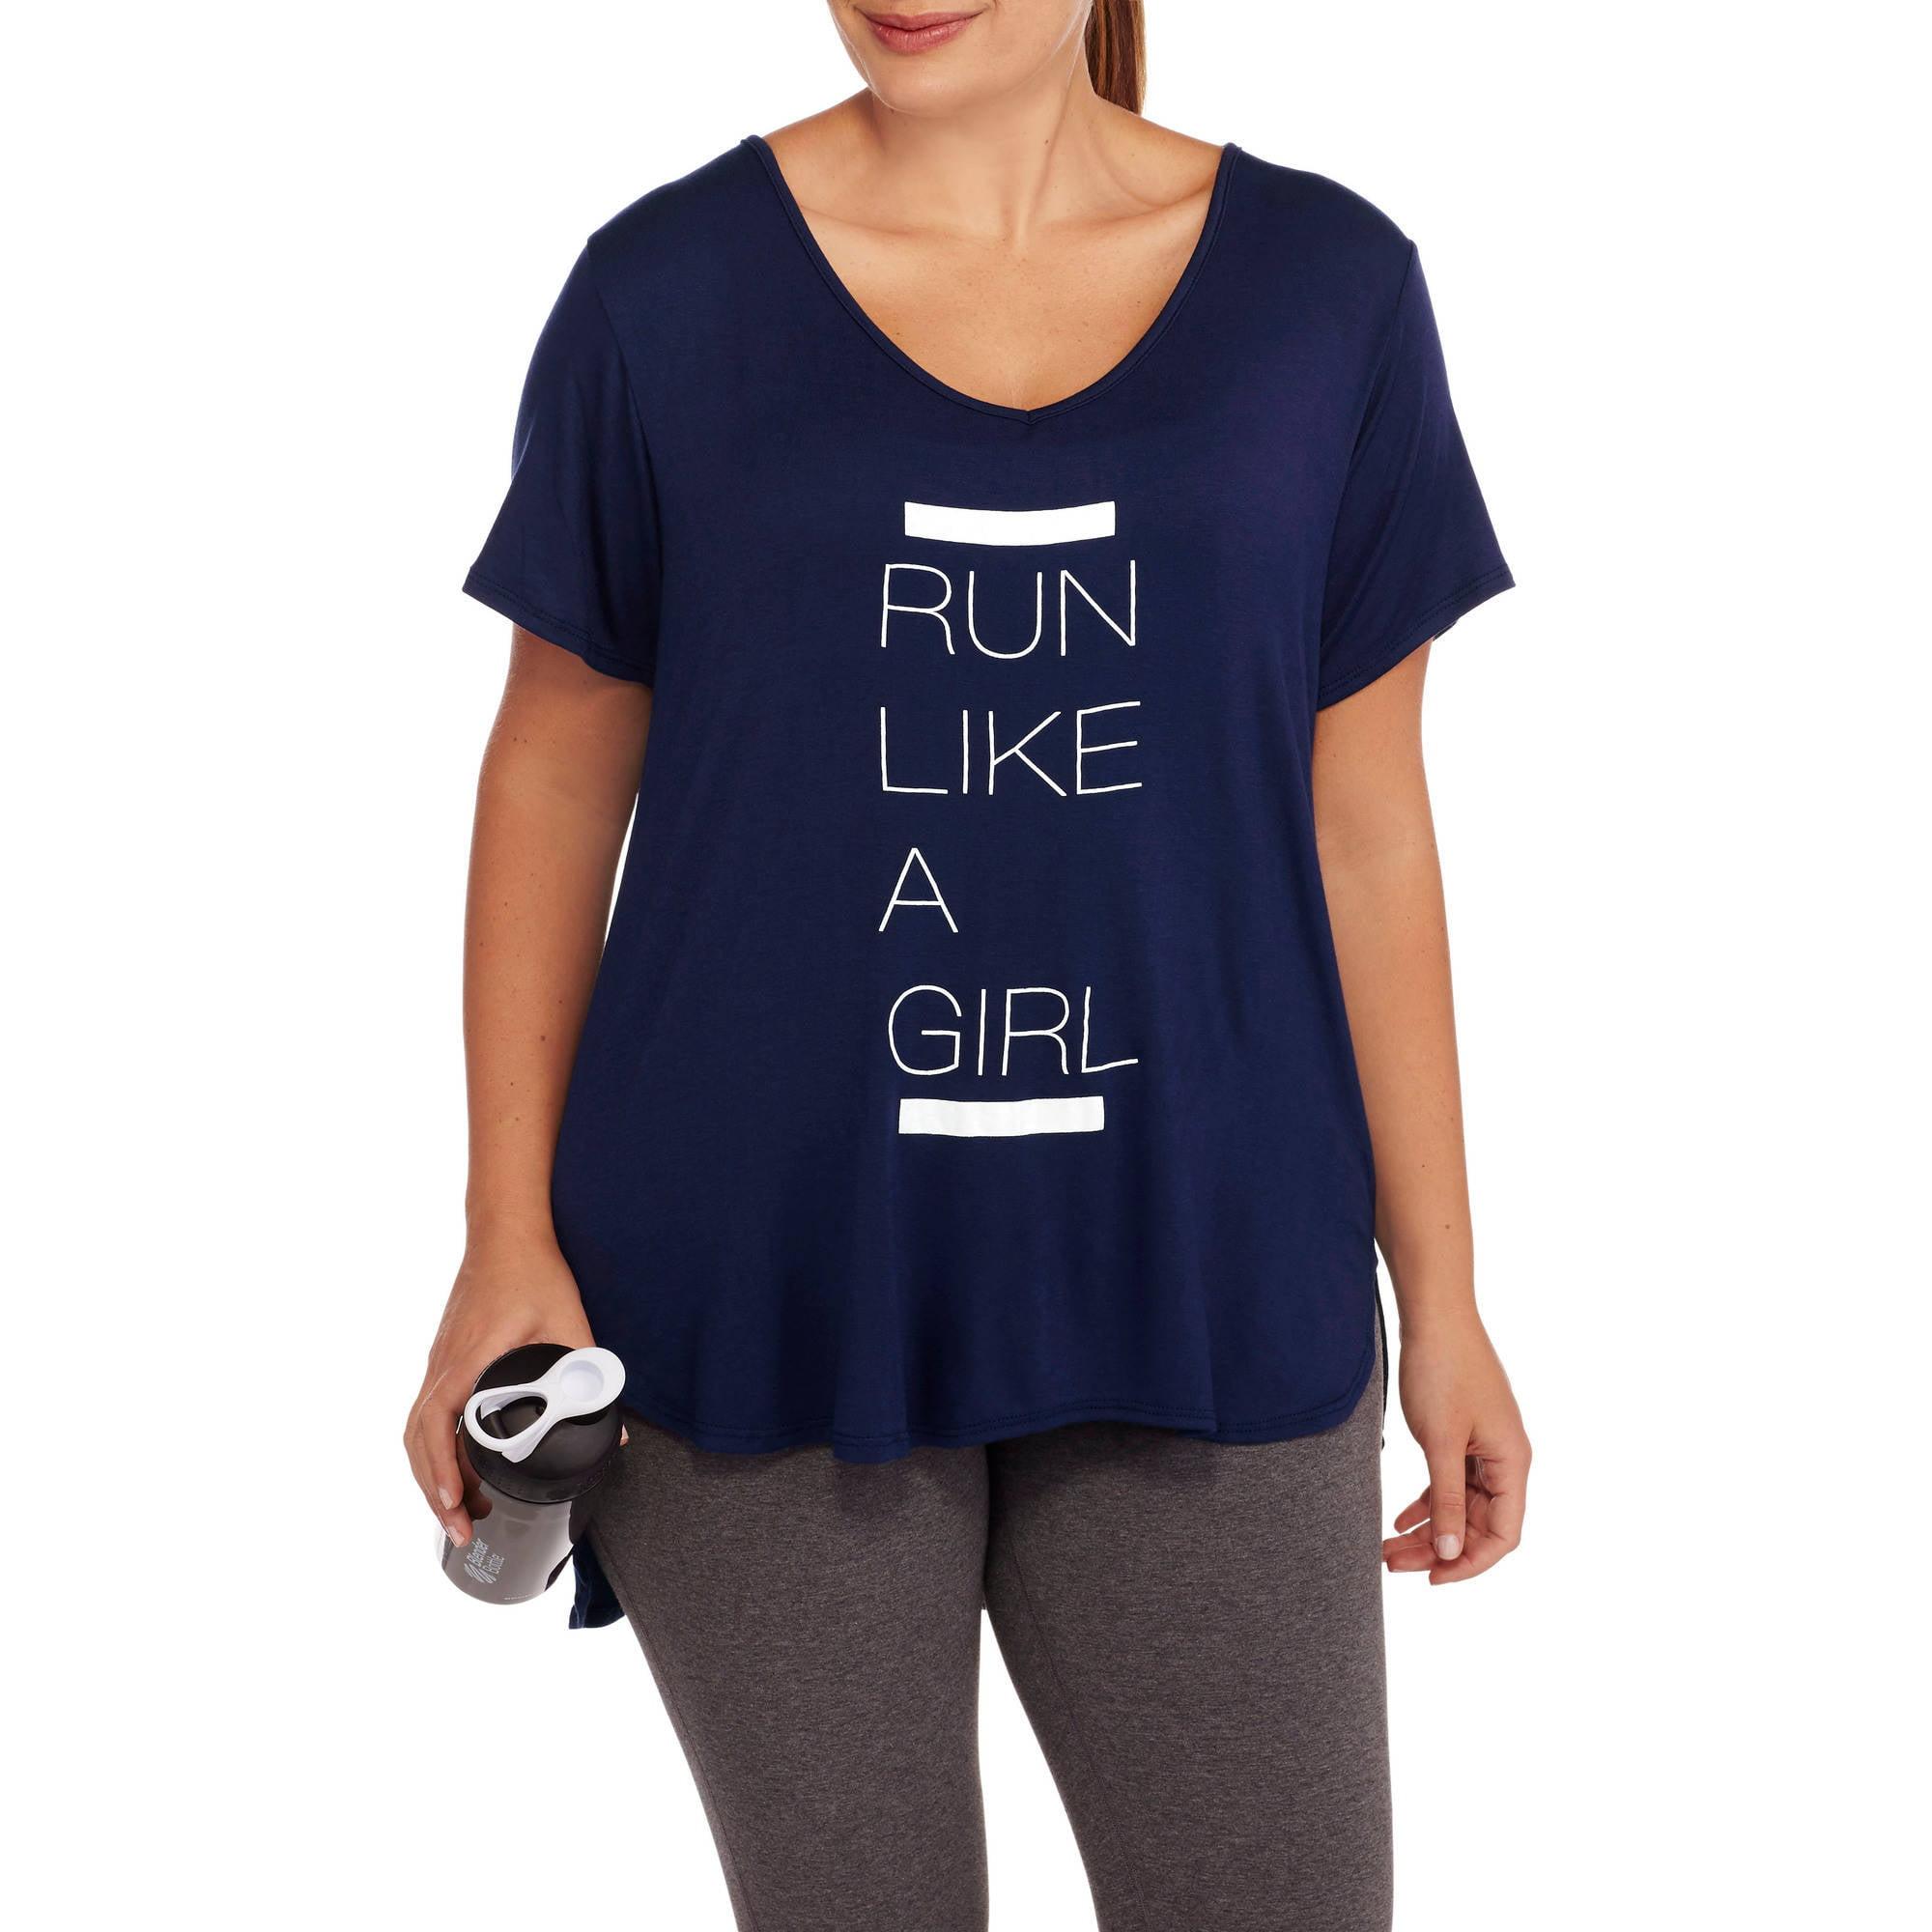 Fitspiration Women's Plus 'Run Like a Girl' Short Sleeve V-Neck Active Graphic T-Shirt